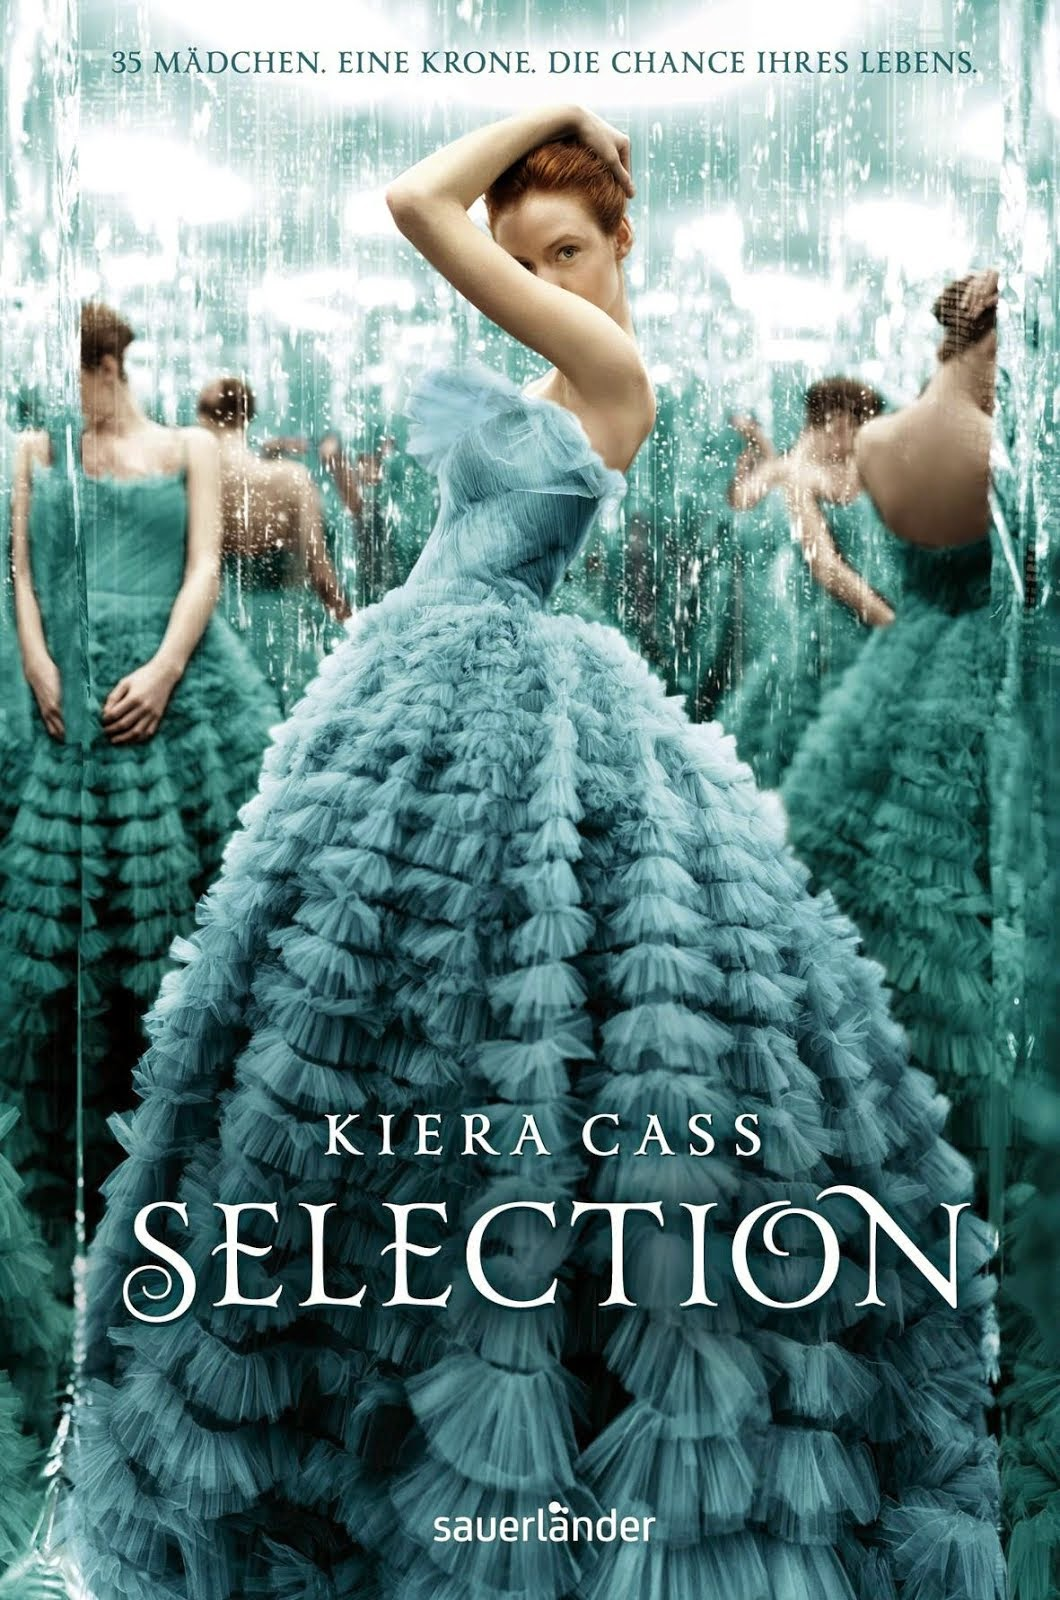 http://lecturesetcie.blogspot.com/2014/08/chronique-kiera-cass-fait-sa-selection.html